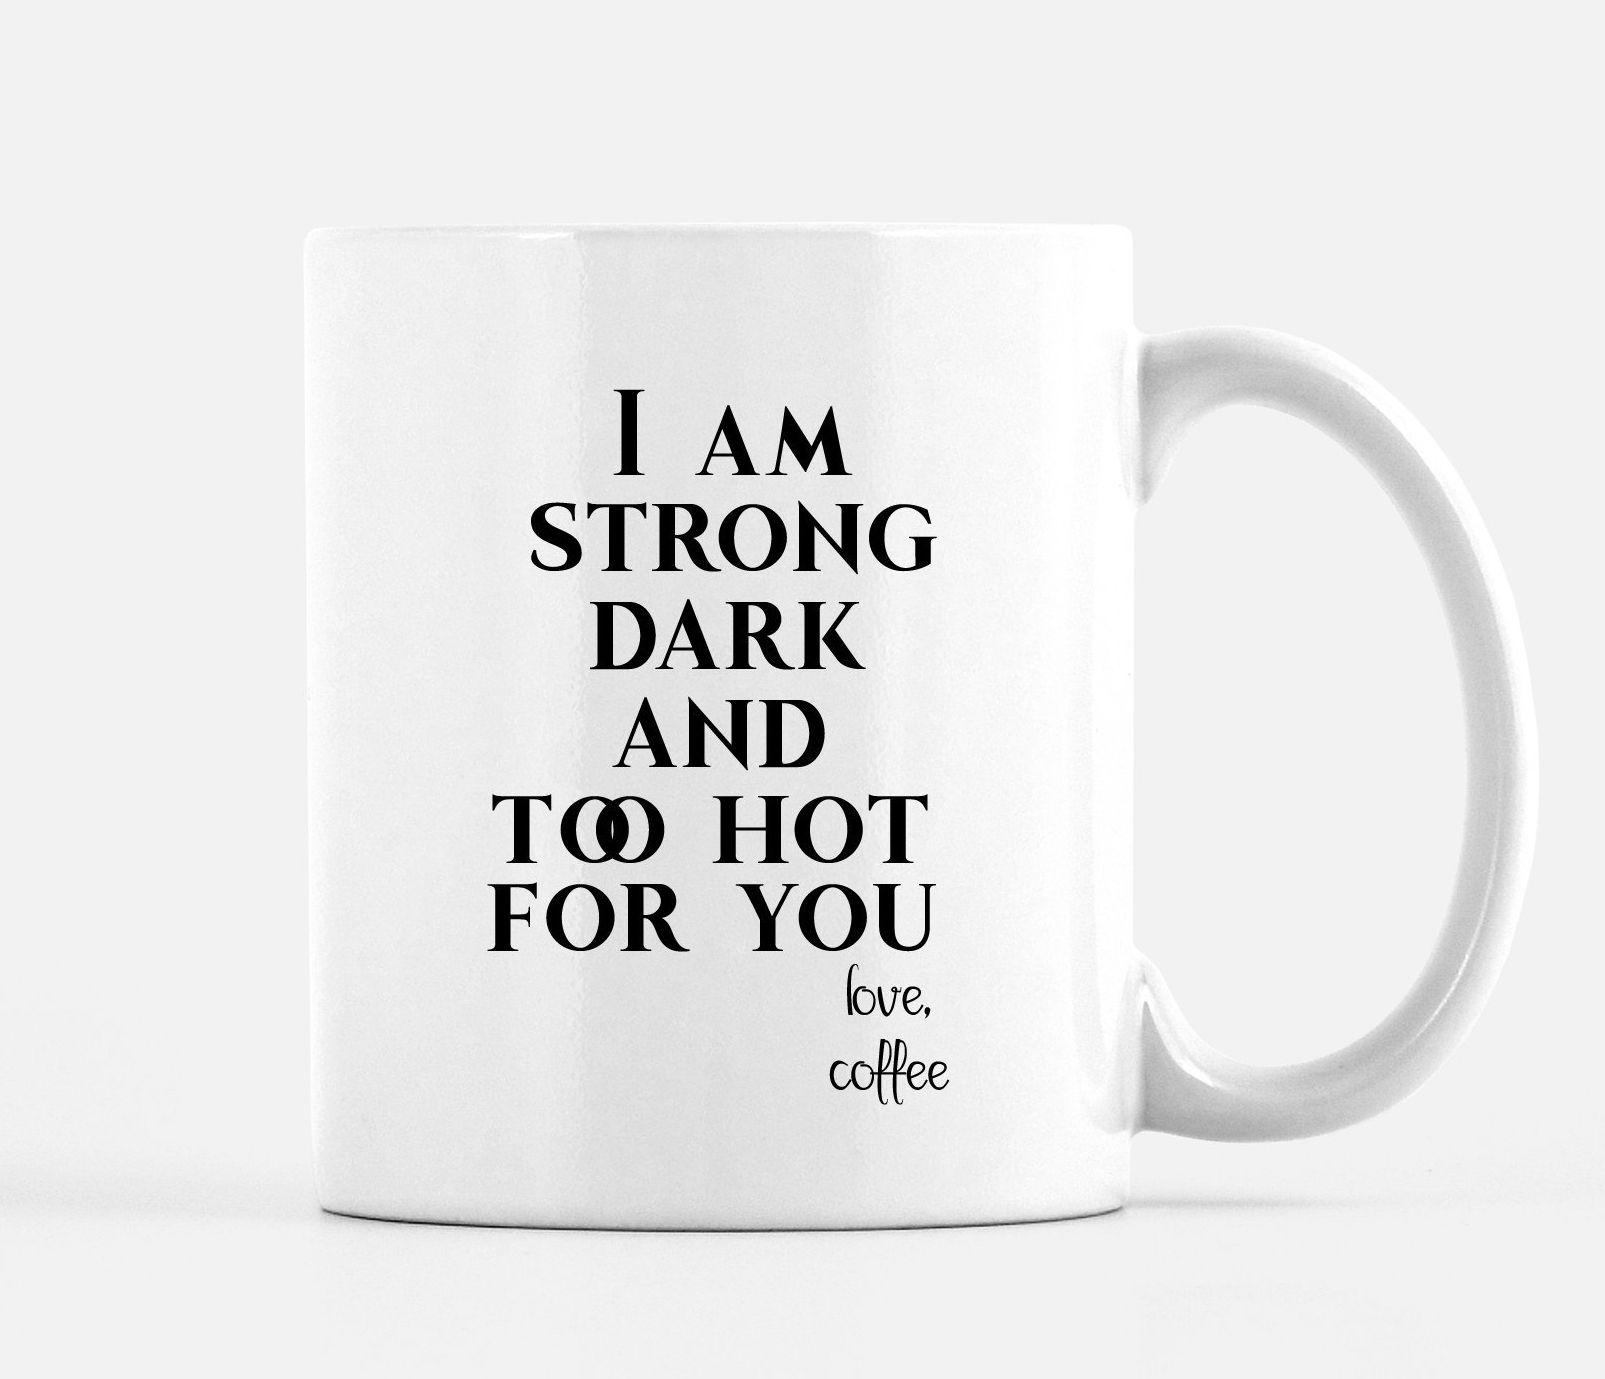 Coffee lover gift funny coffee mug strong dark and hot